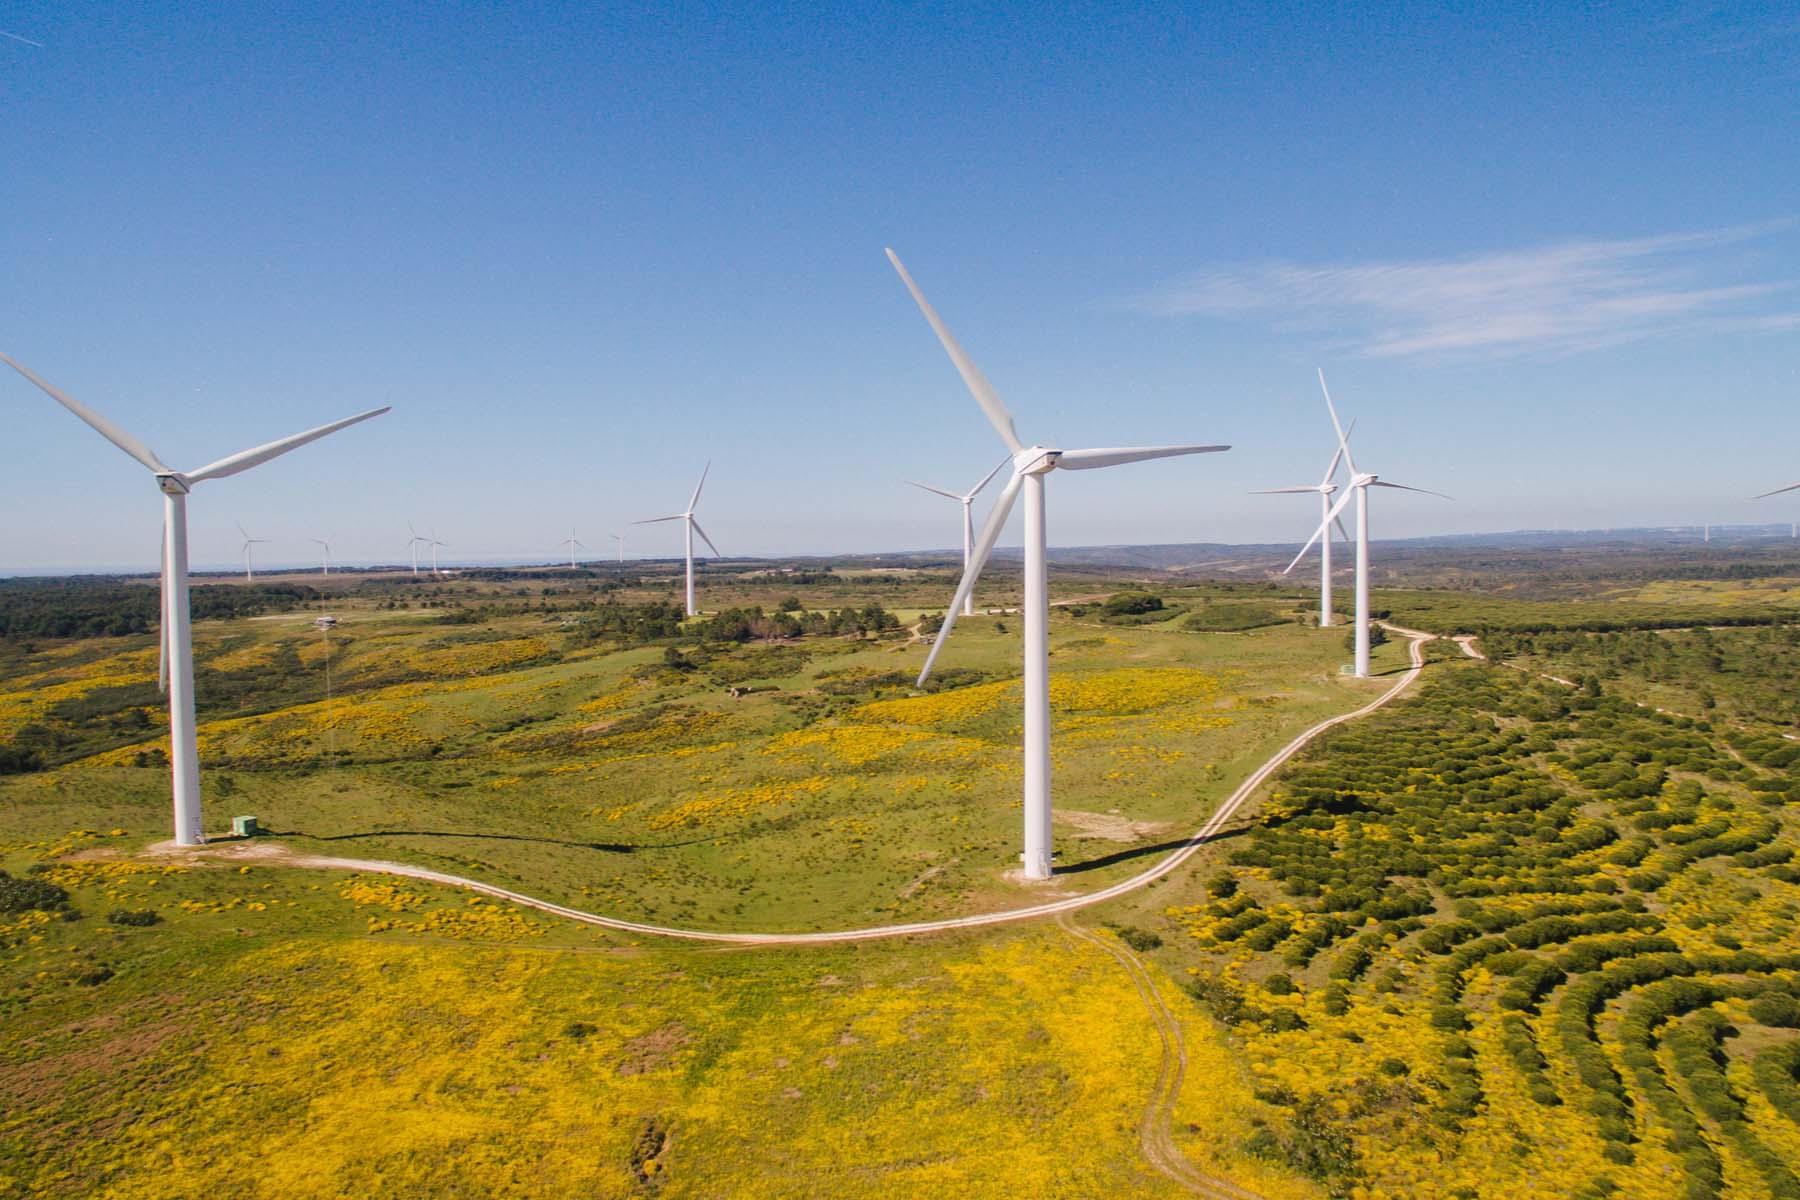 wind farm in Portugal